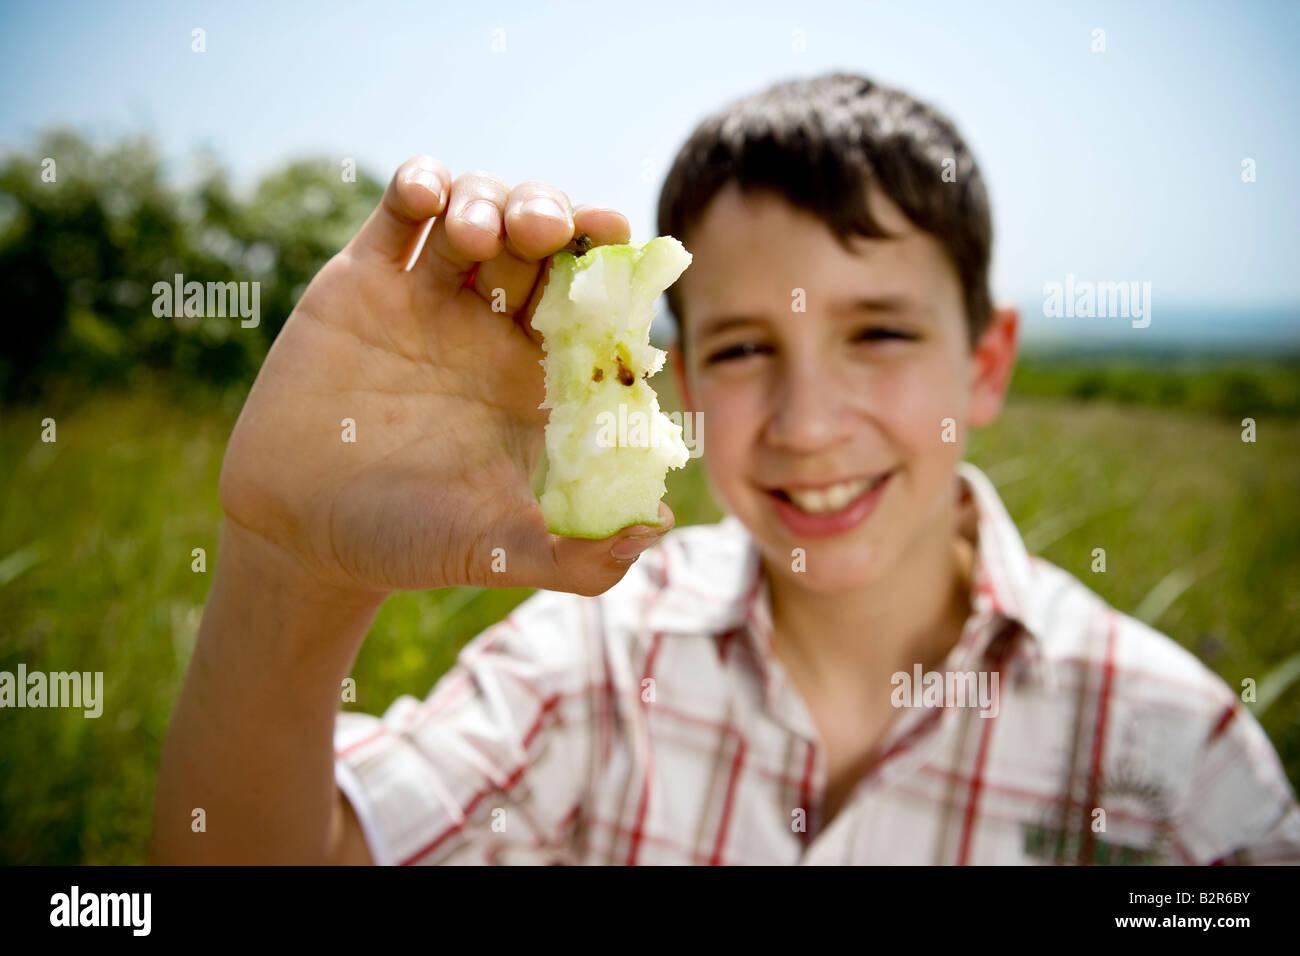 Boy holding up apple core - Stock Image